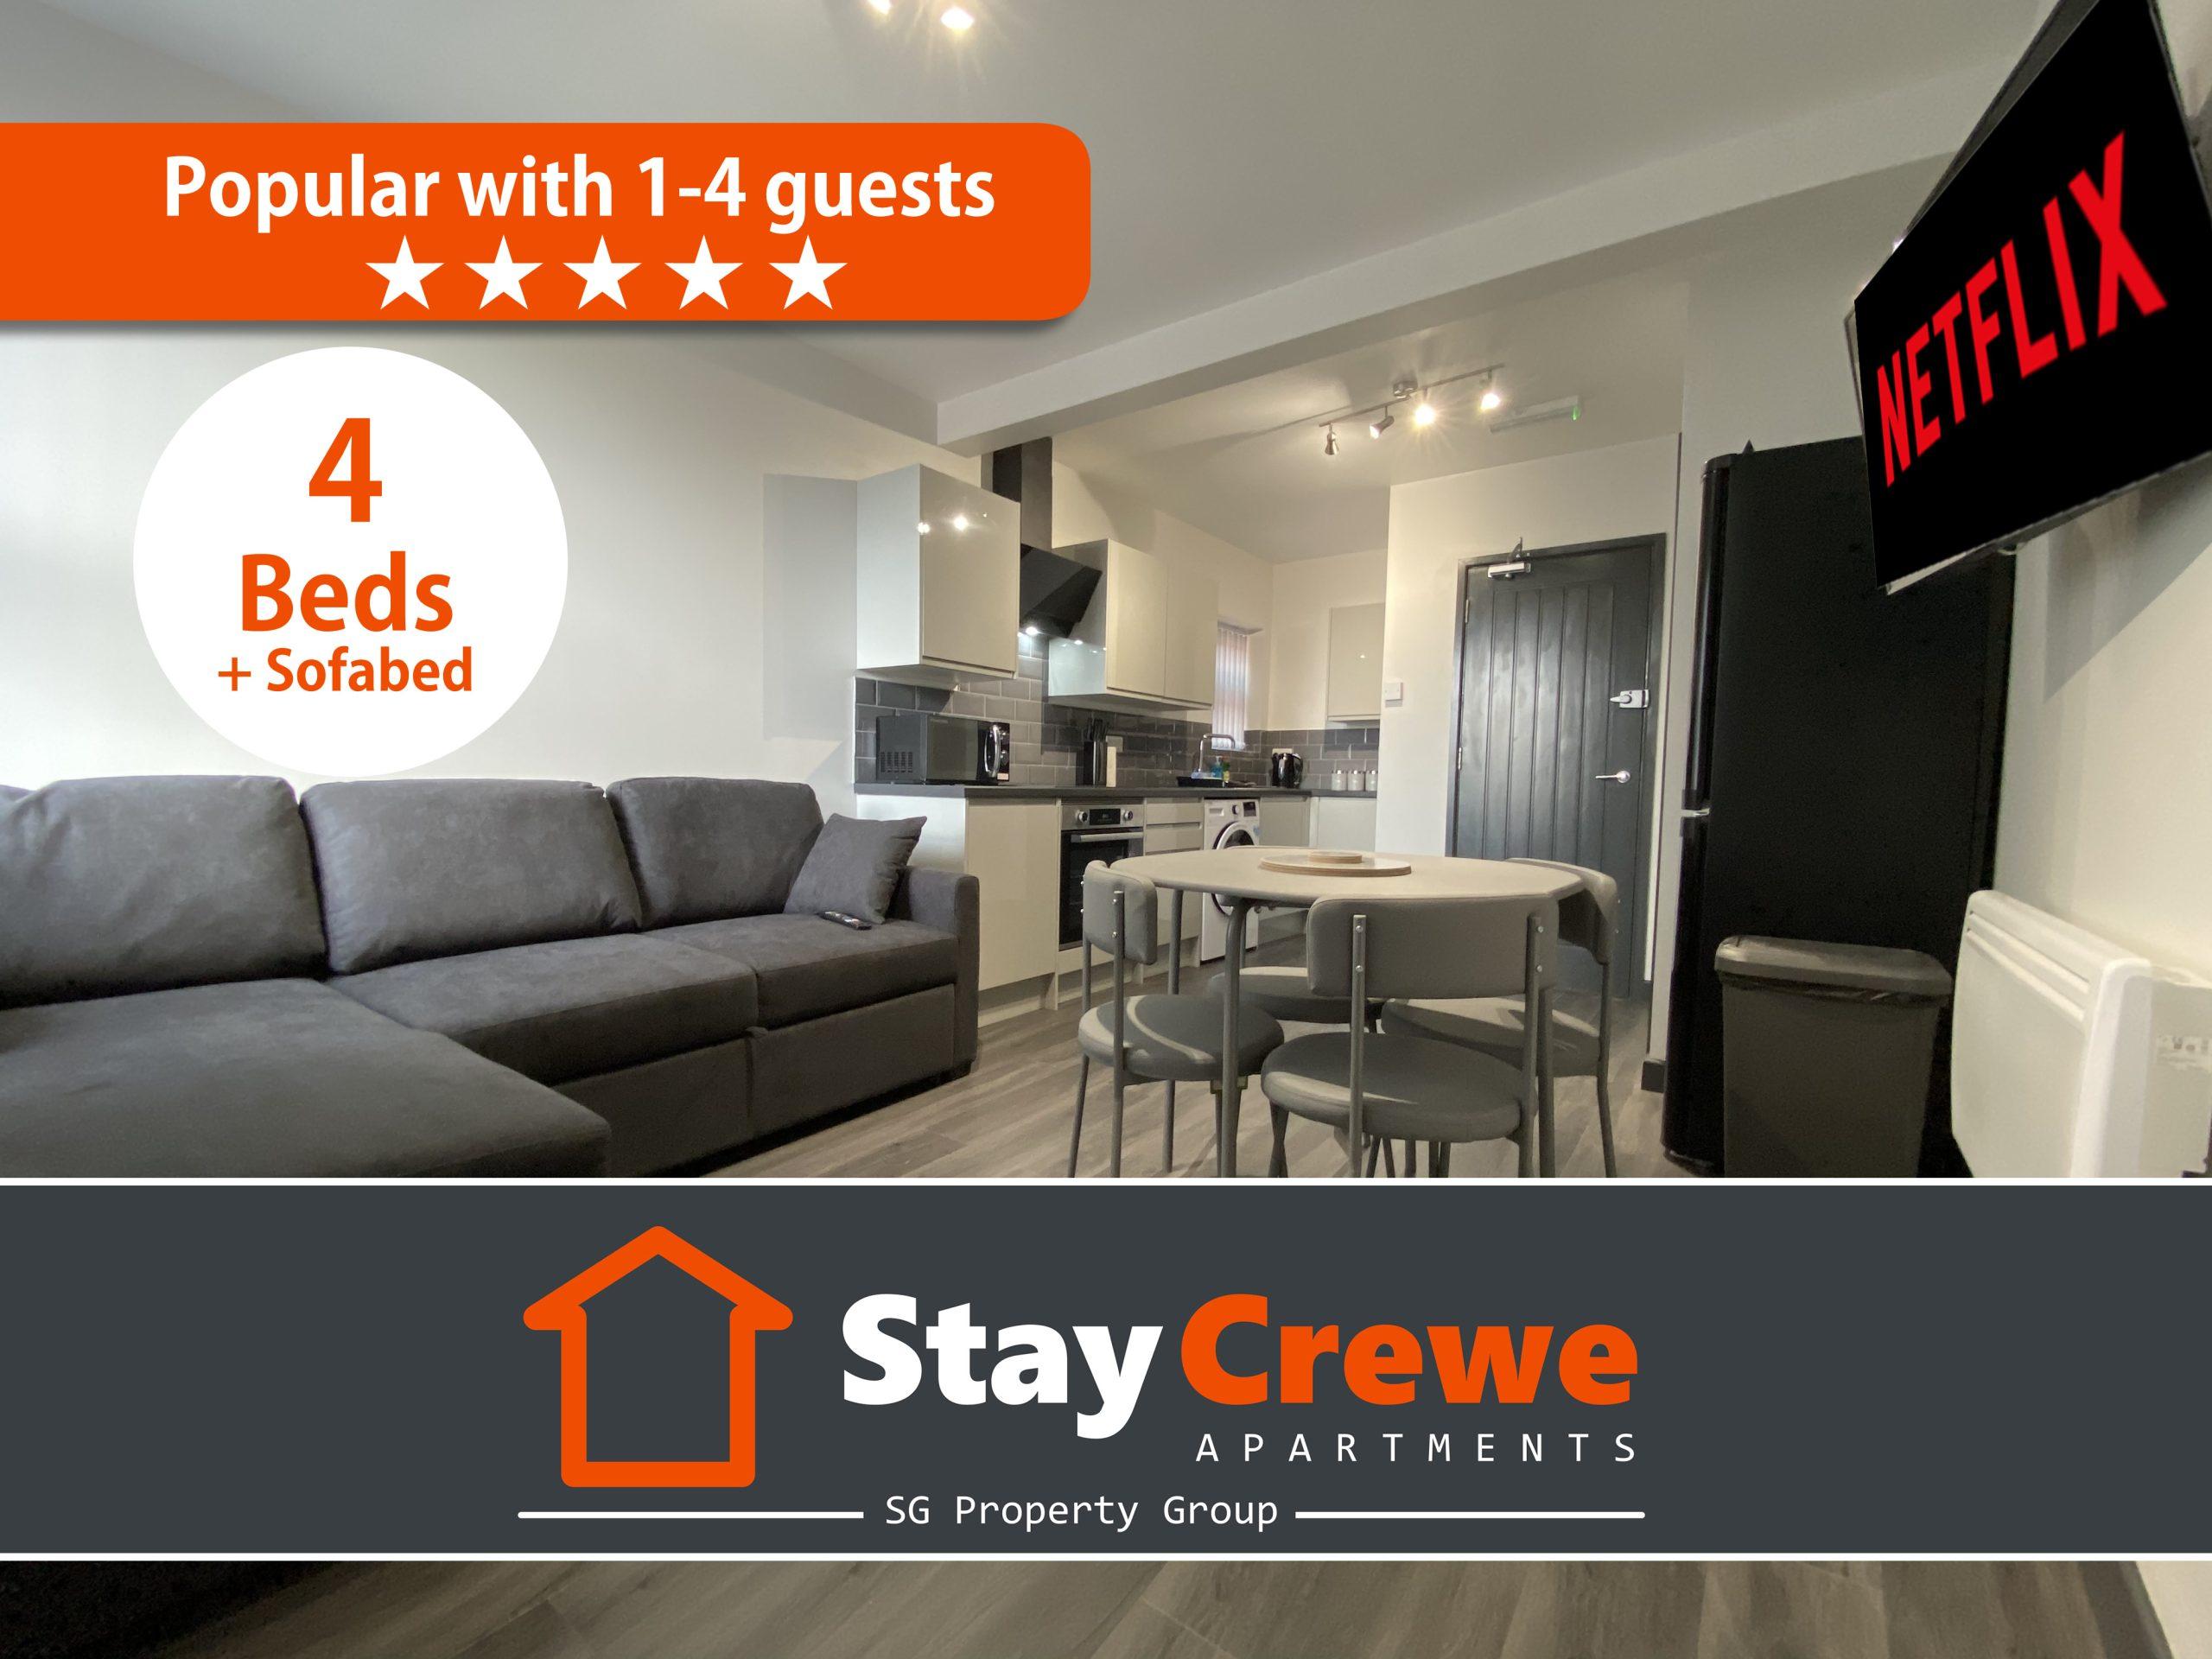 StayCrewe Apartments – Apt 3